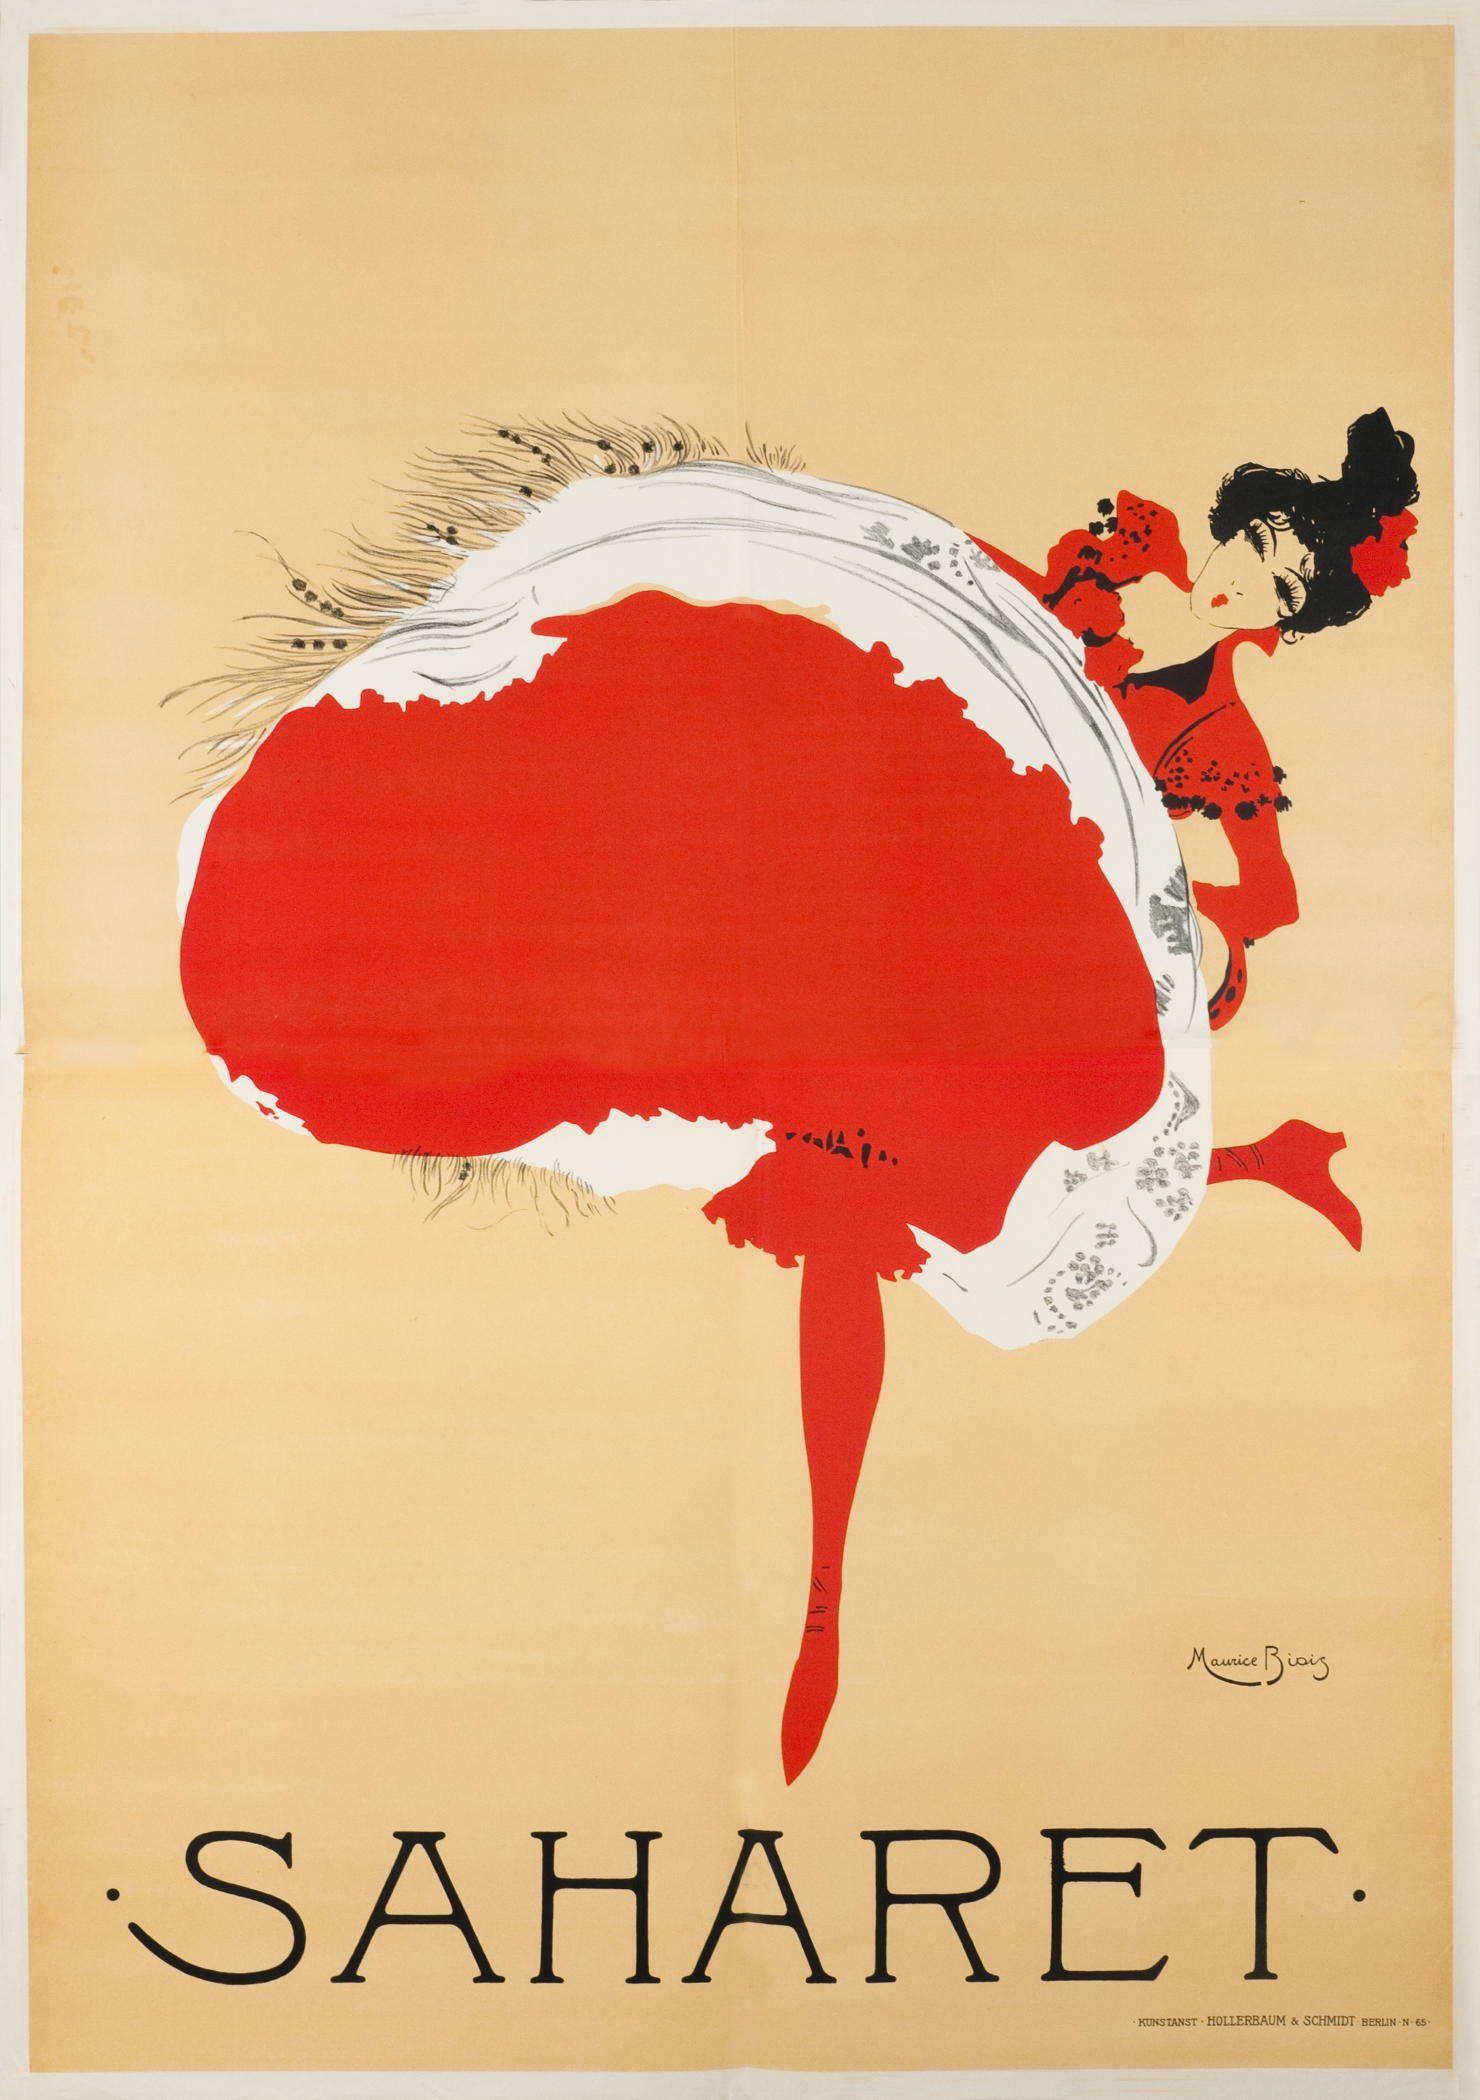 The Massive Online Art Gallery For Vintage Art Prints, Art